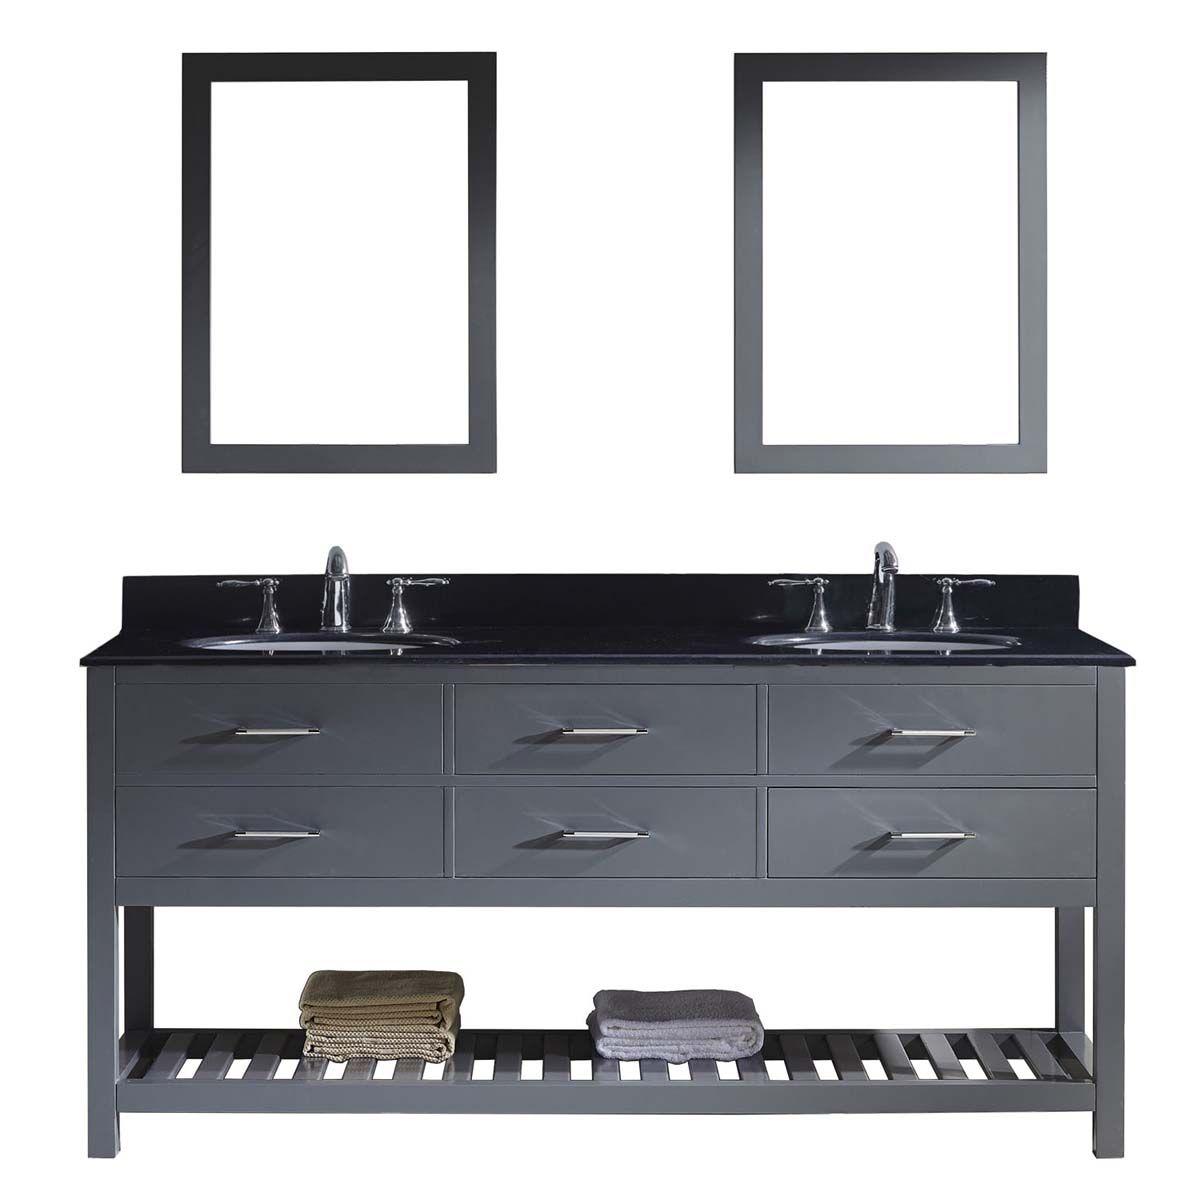 "caroline estate 72"" double bathroom vanity in grey with double mirror best material for a bathroom vanity"